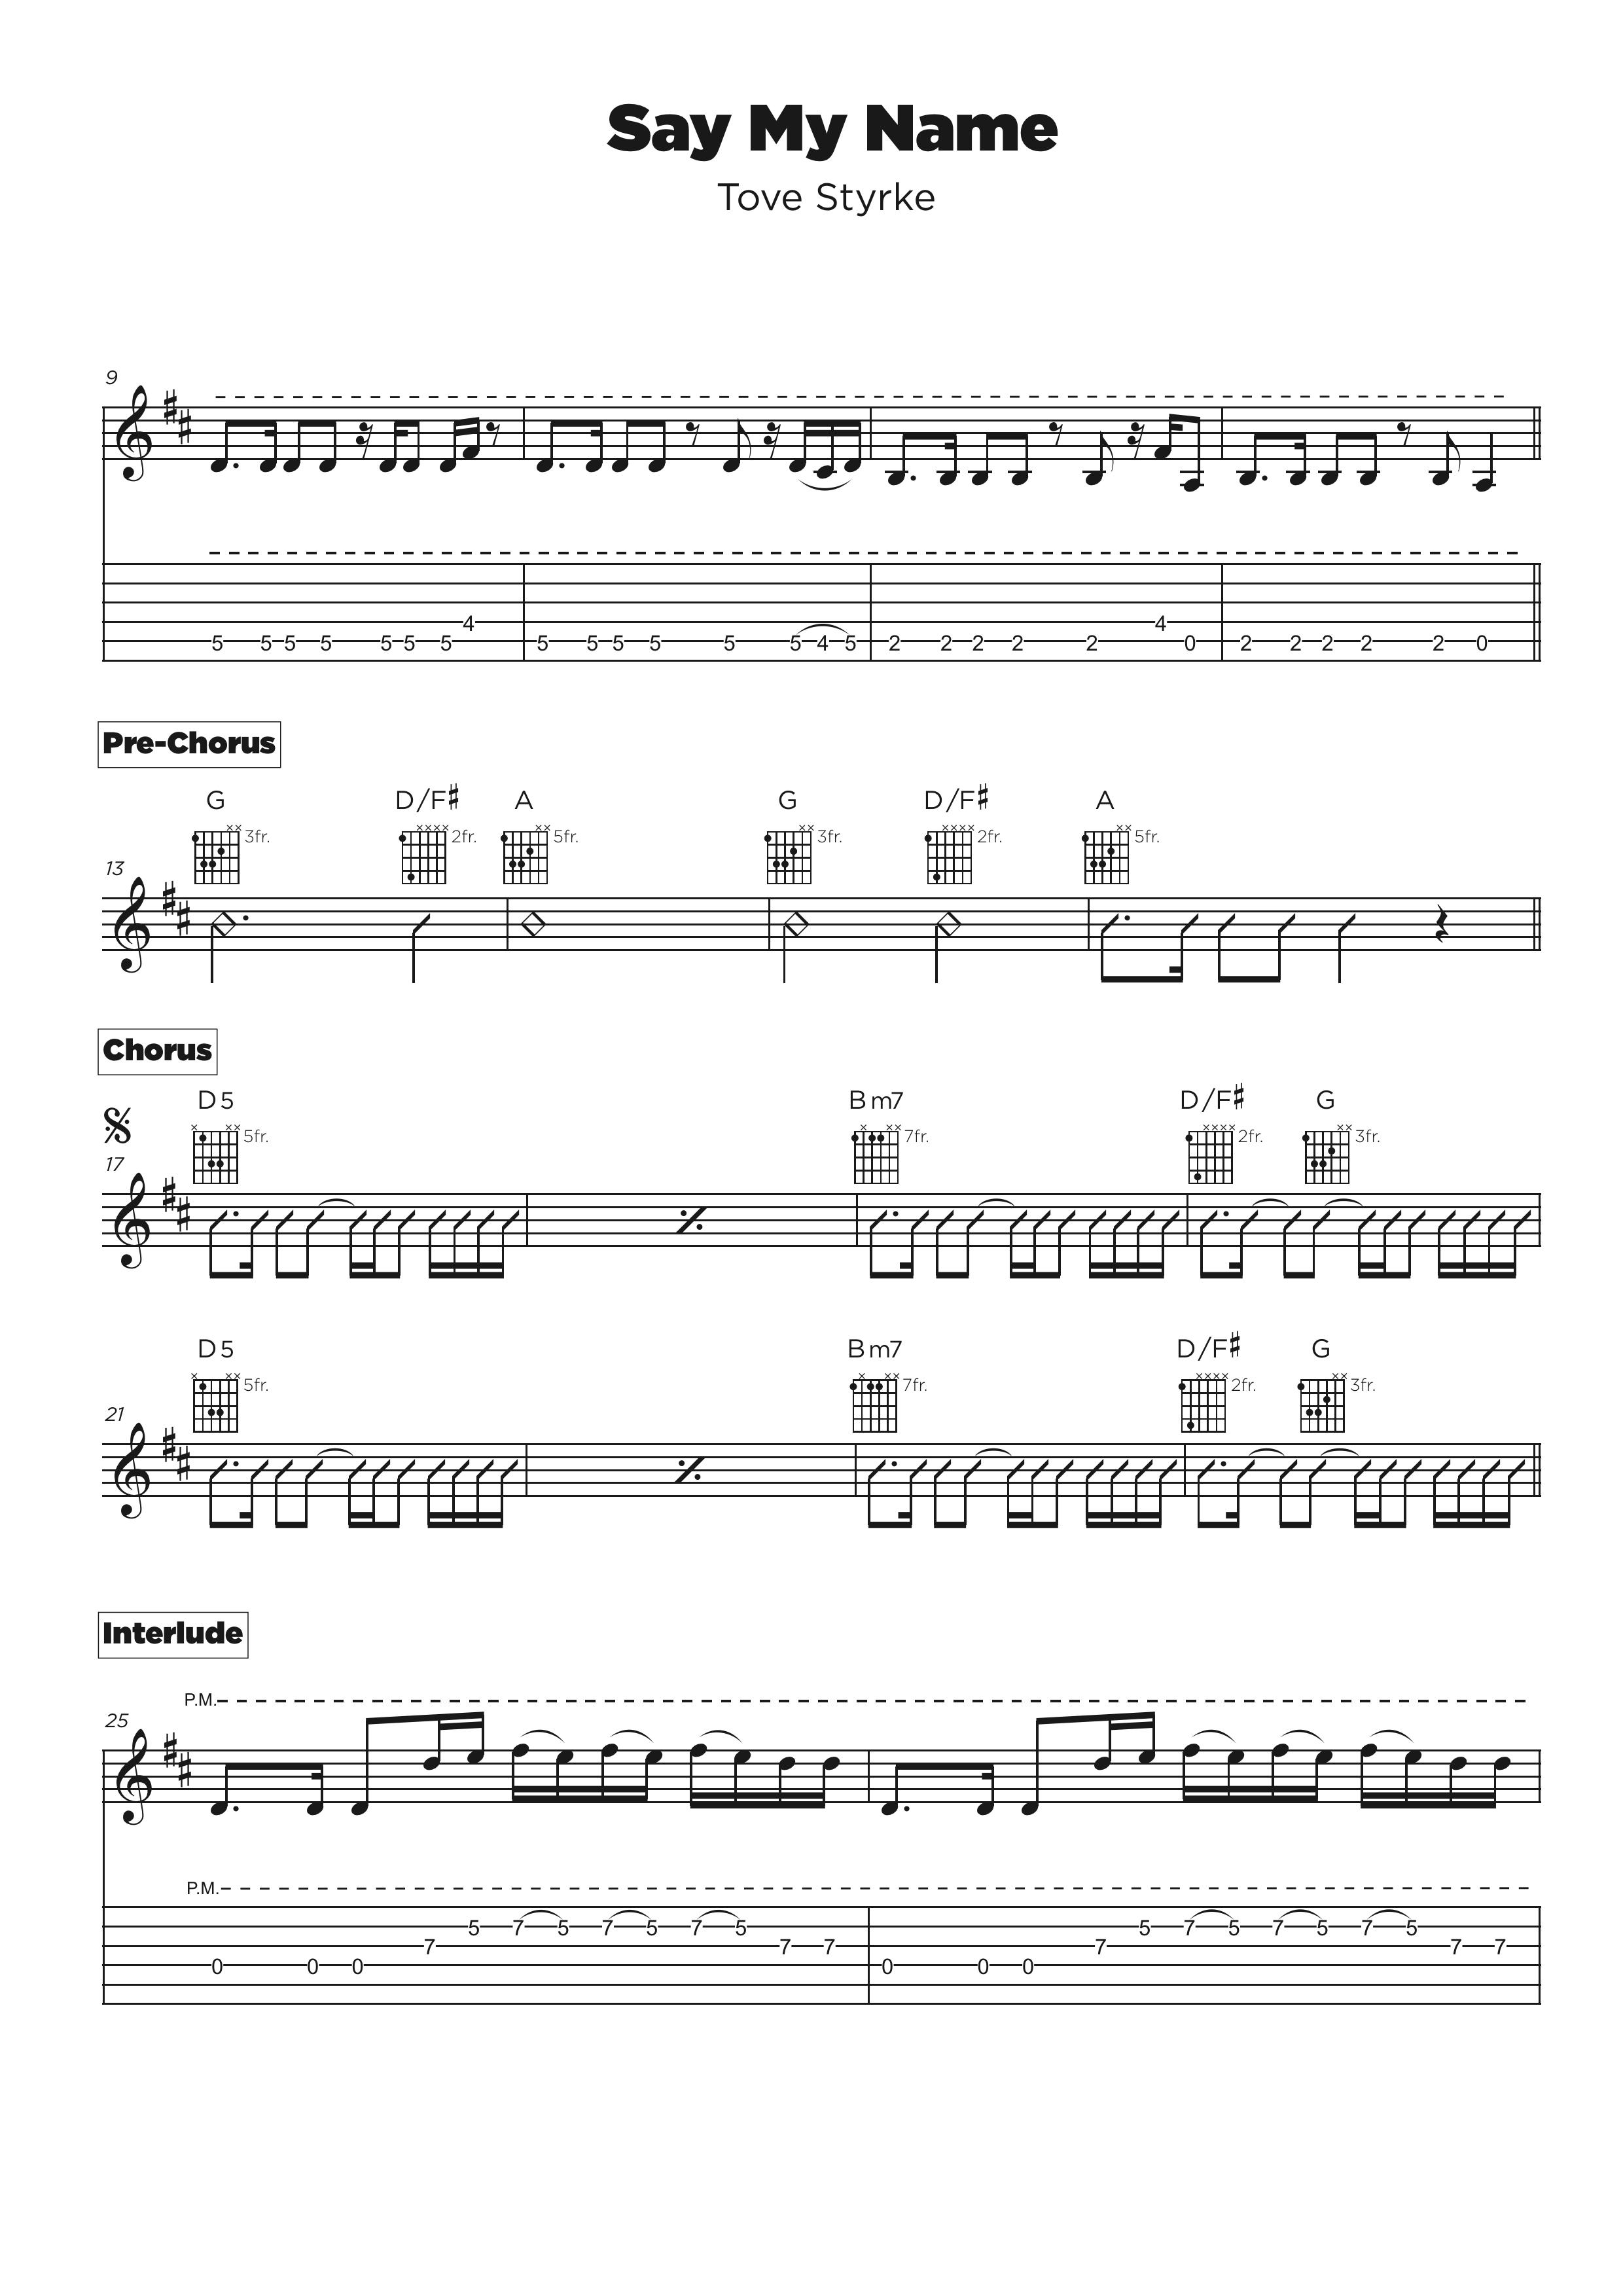 Guitar Tab Transcription Service • My Sheet Music Transcriptions